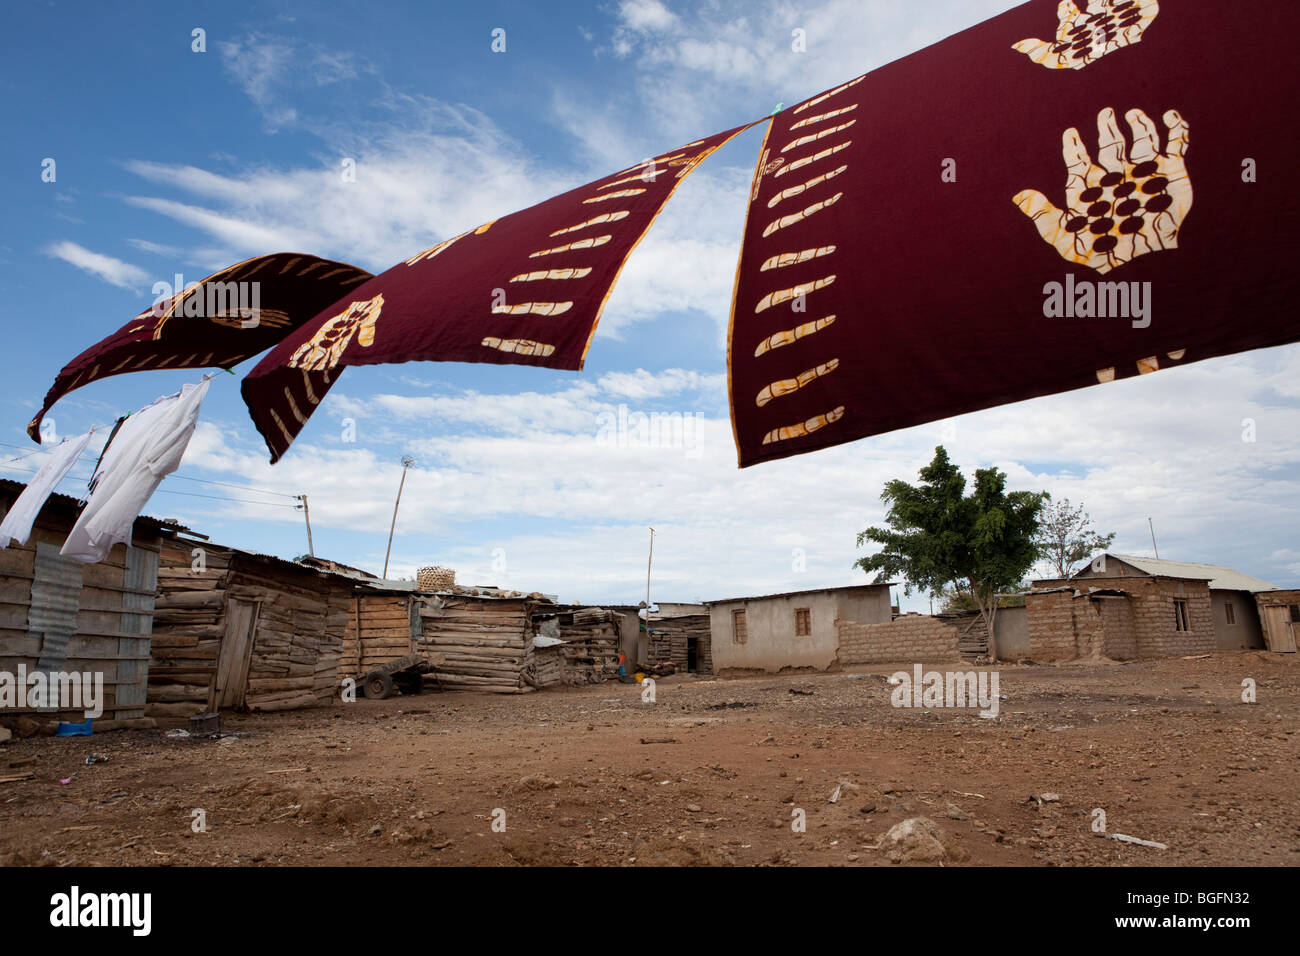 Séchage en tissu sur la ligne, Mererani, la Tanzanie, la seule source connue de tanzanite. L'Afrique de Photo Stock